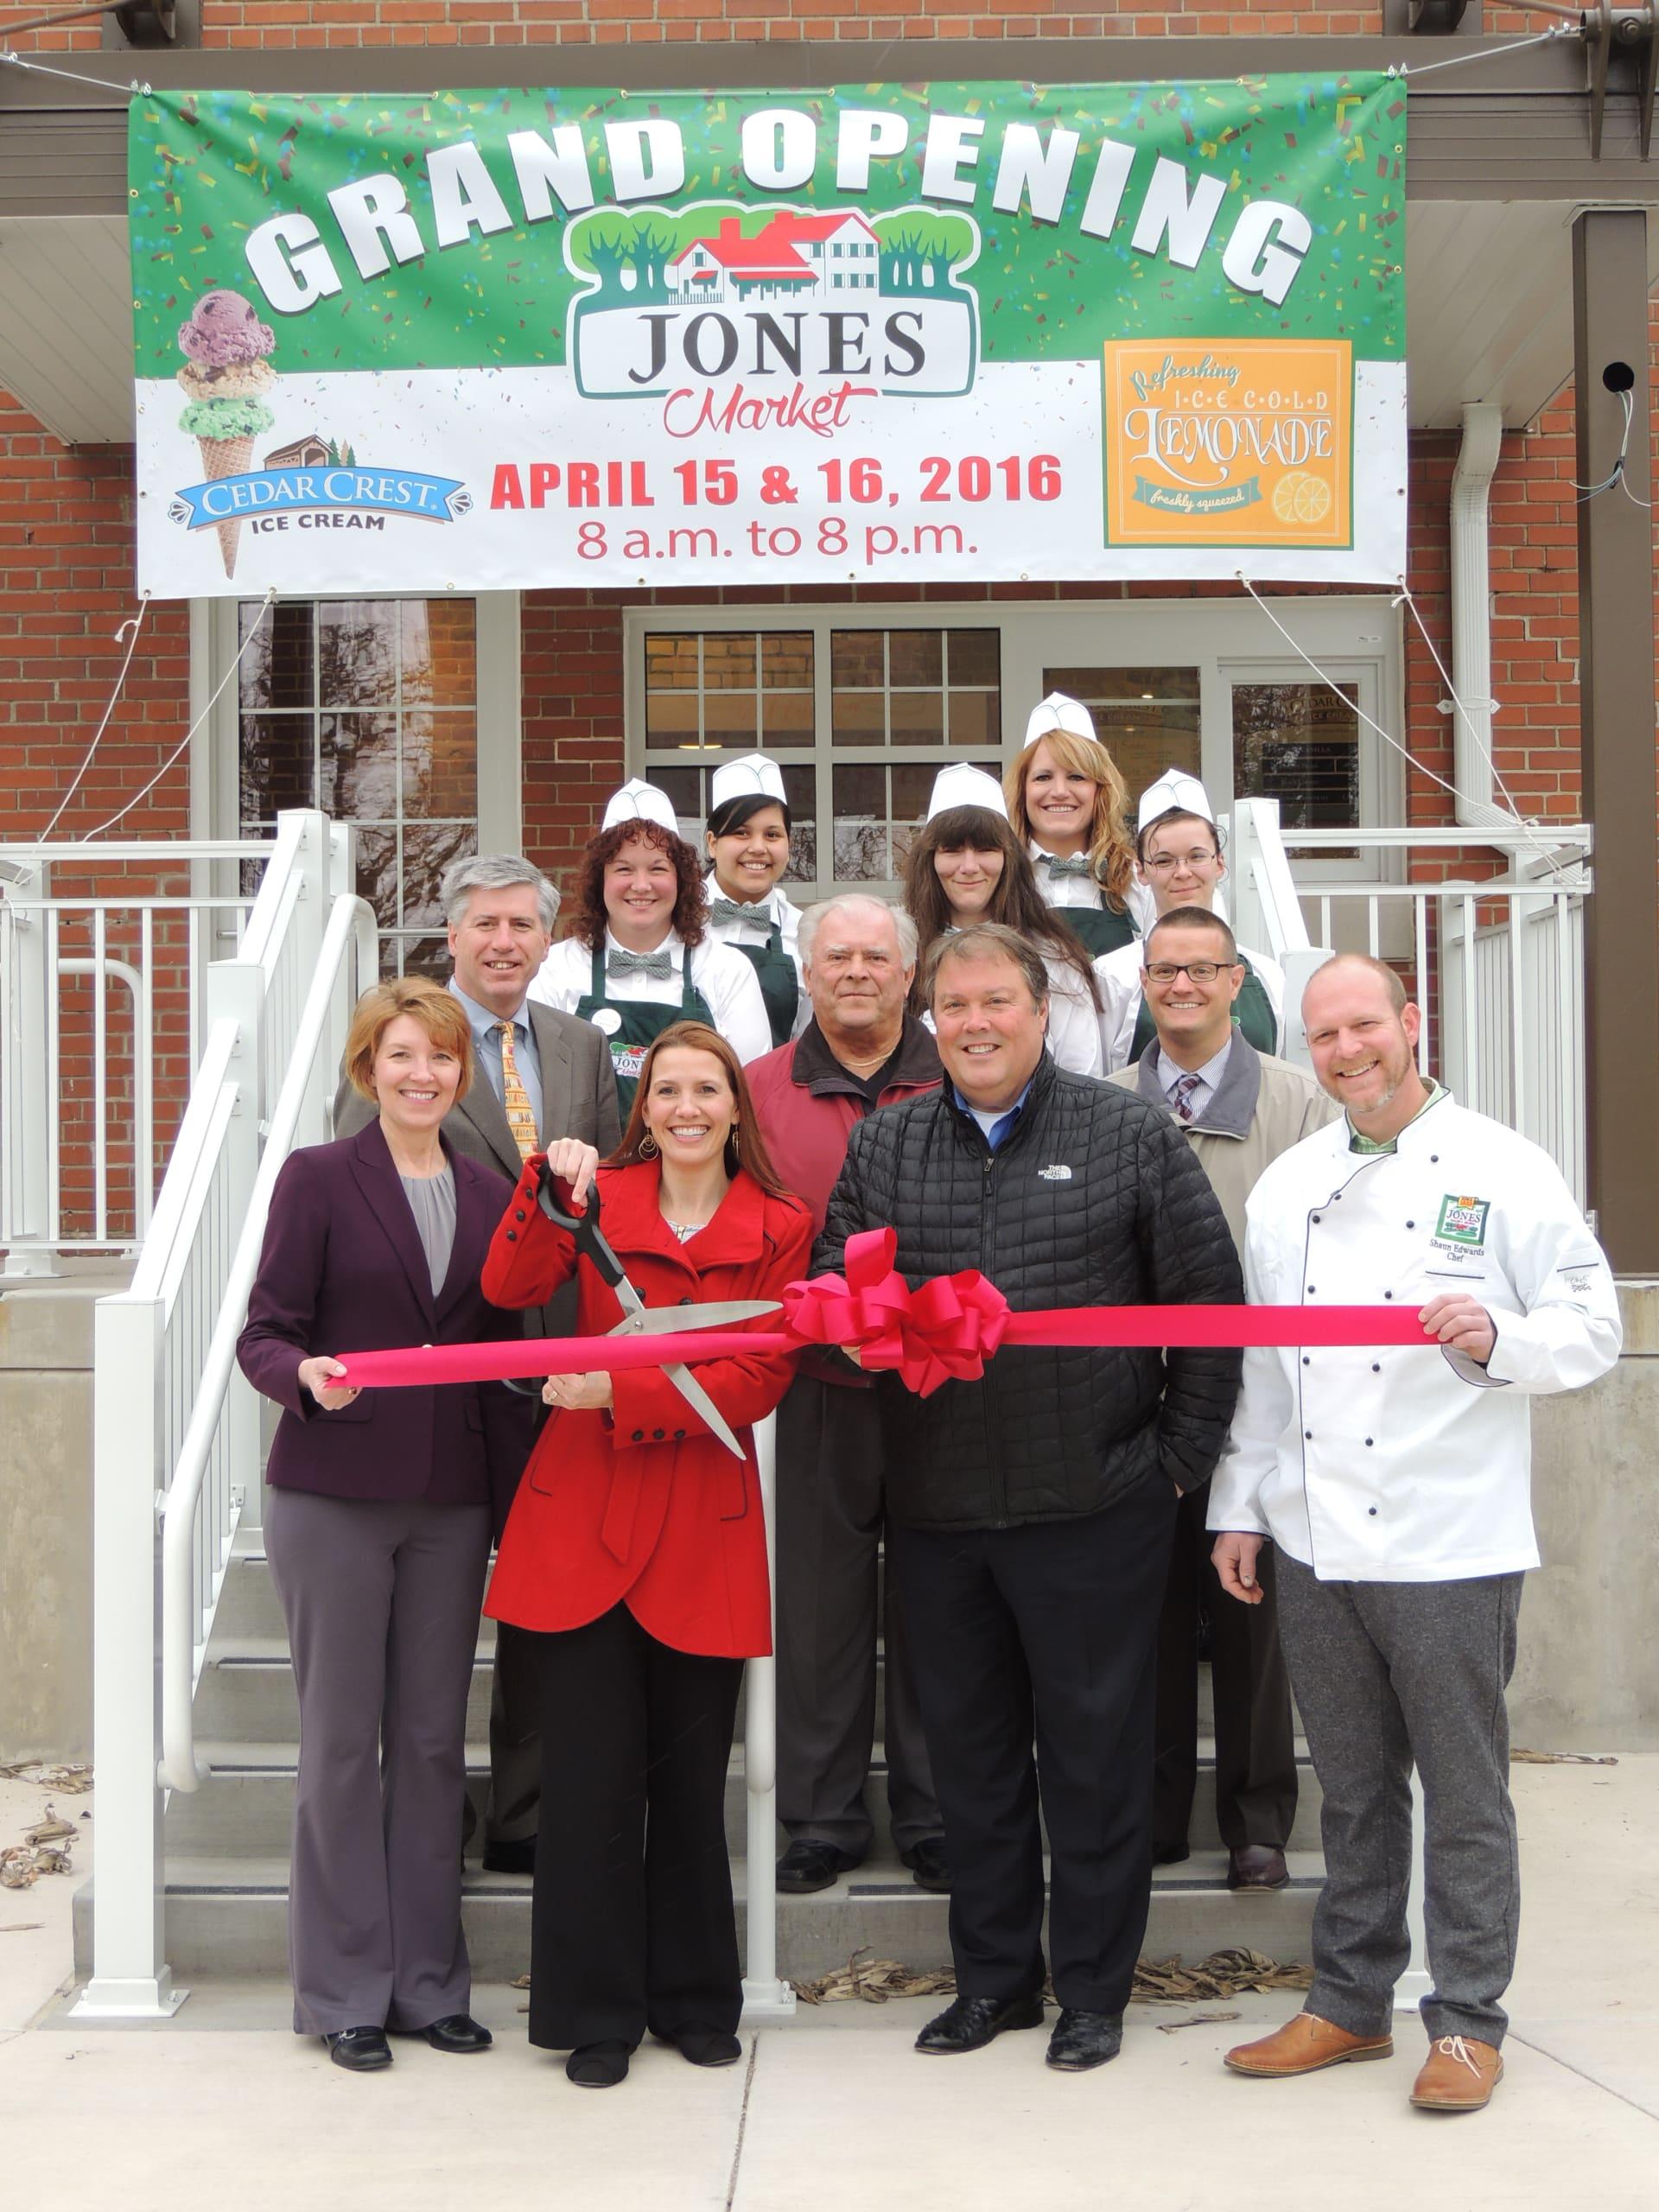 Jones-Market.JPG-w1920.jpg